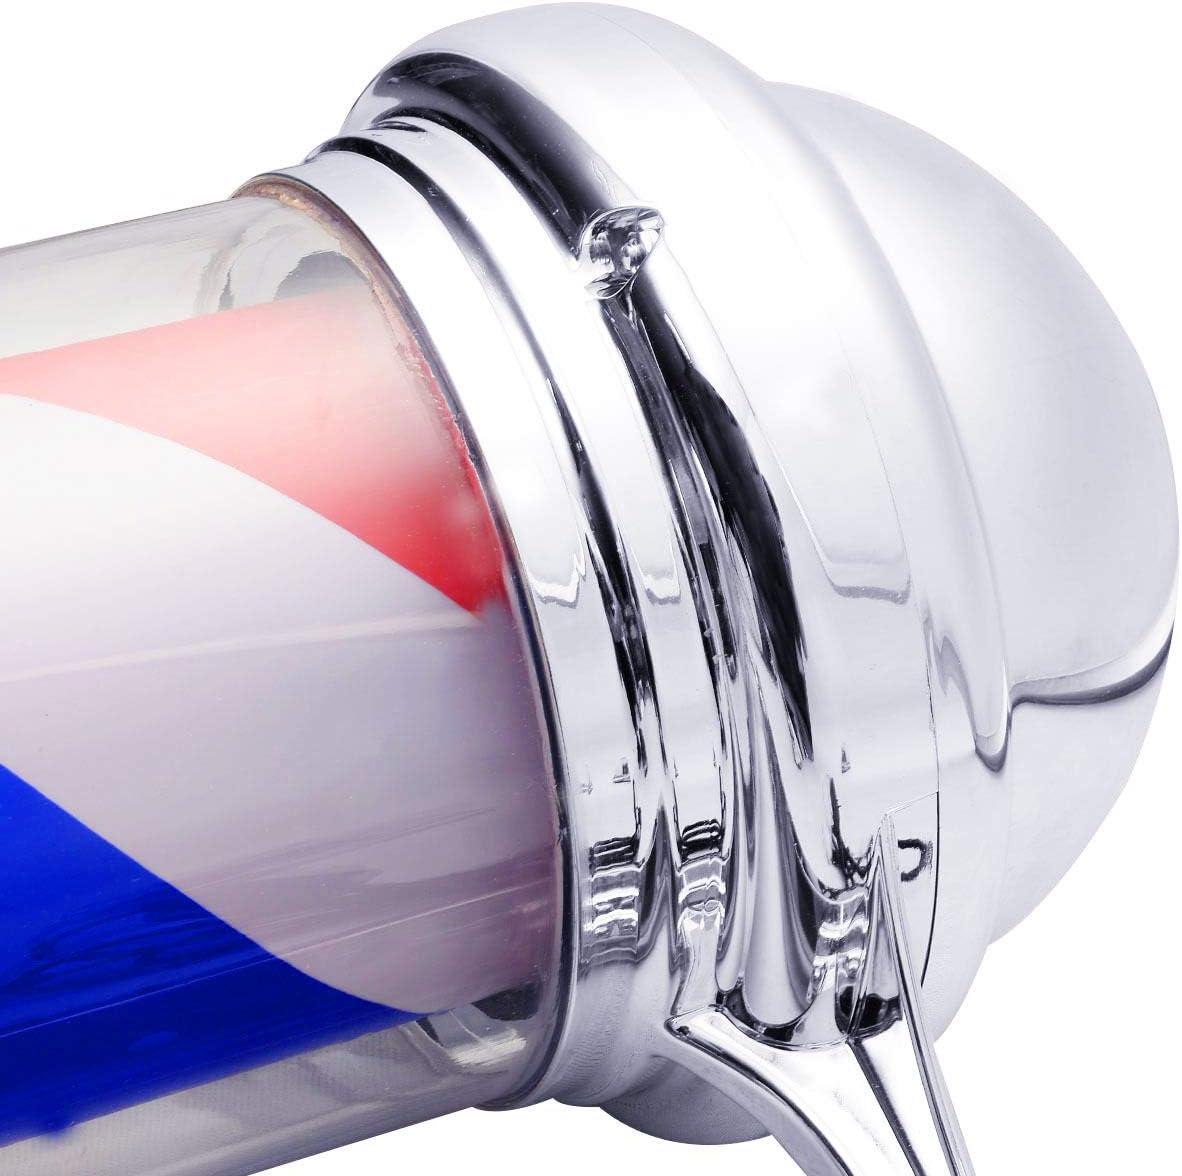 Giantex 30 Barber Shop Pole Red White Blue Rotating Light Stripes Sign Hair Salon